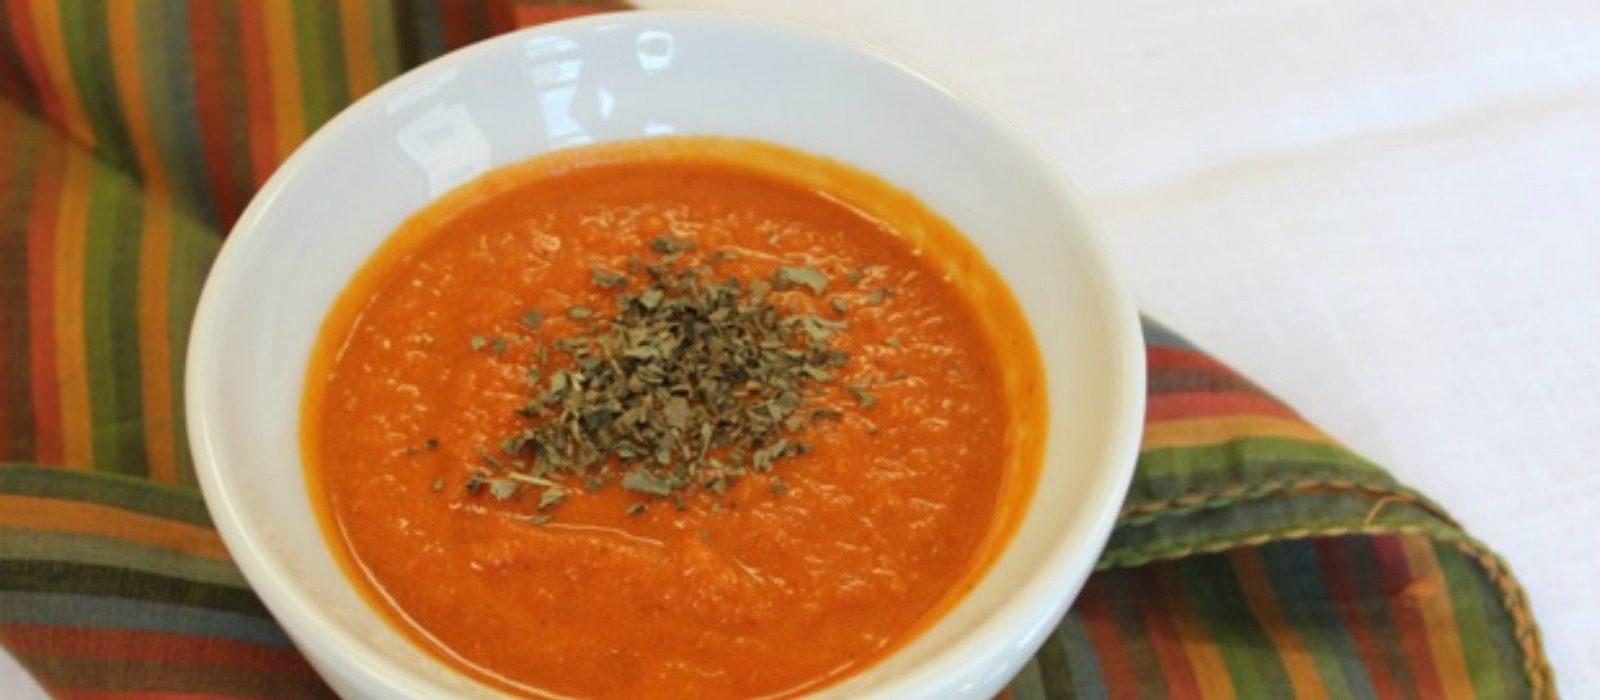 Slow Cooker Creamy Tomato Soup